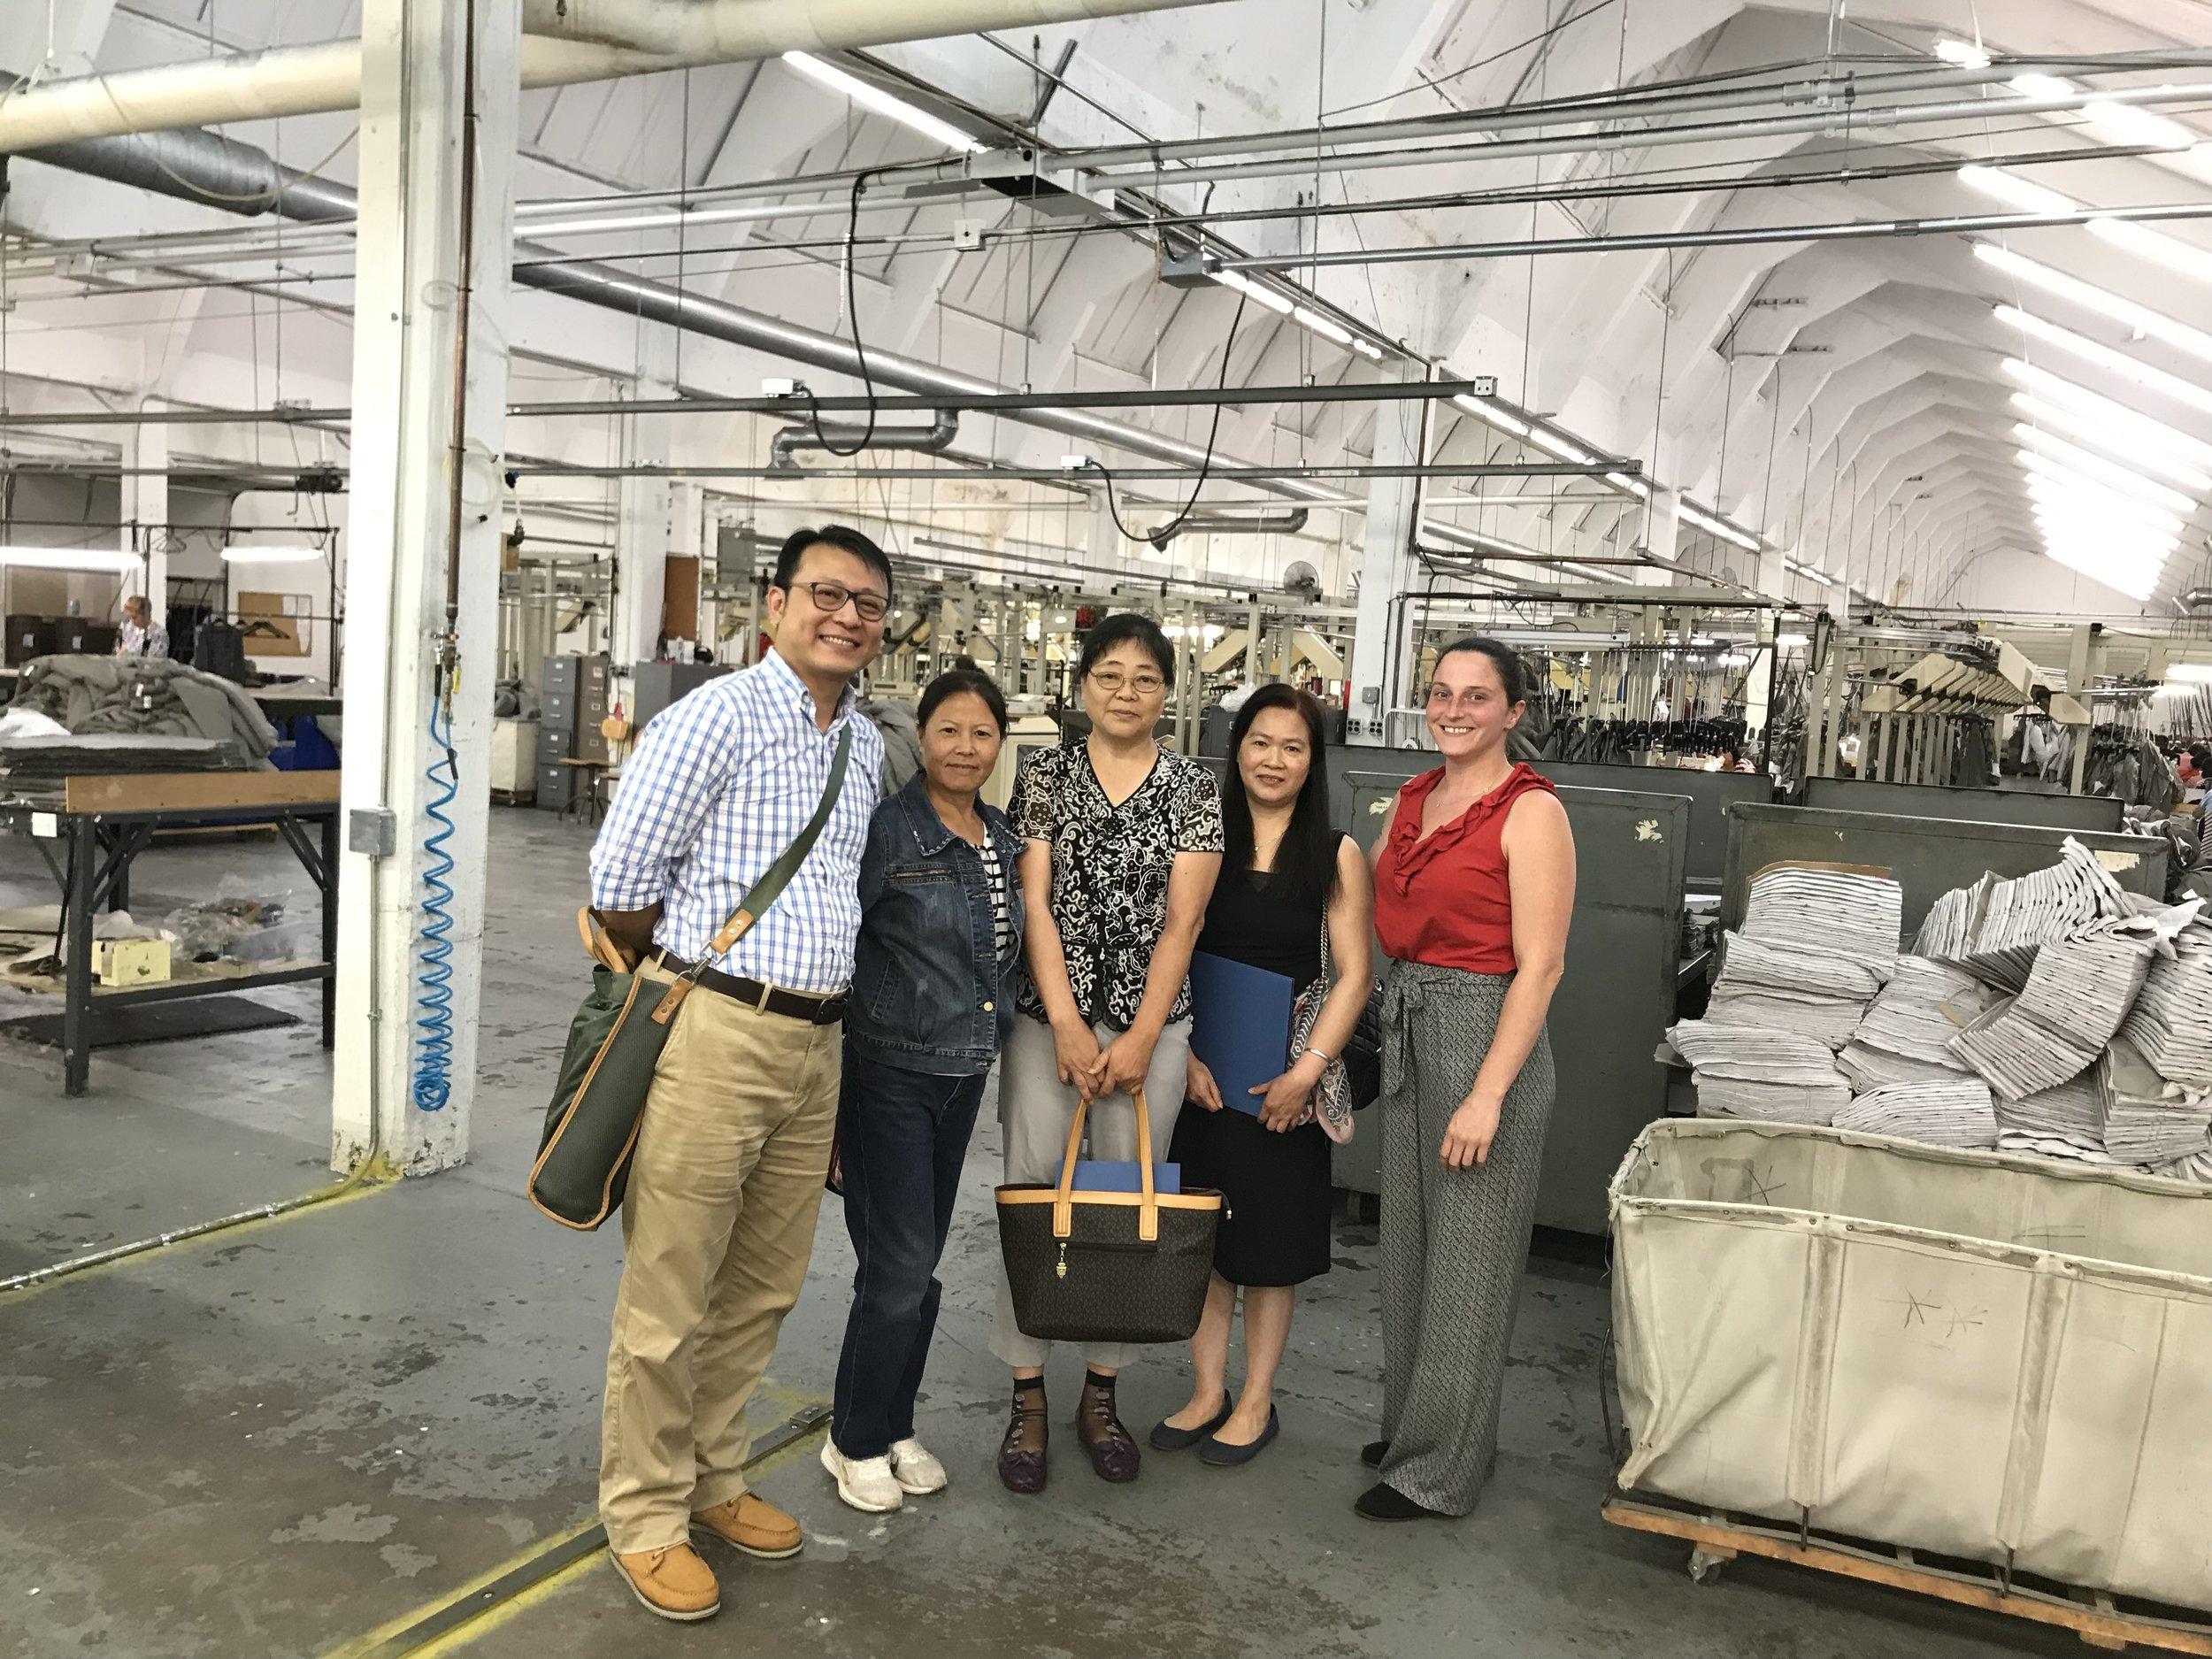 A workplace of community & inclusion - Sterlingwear